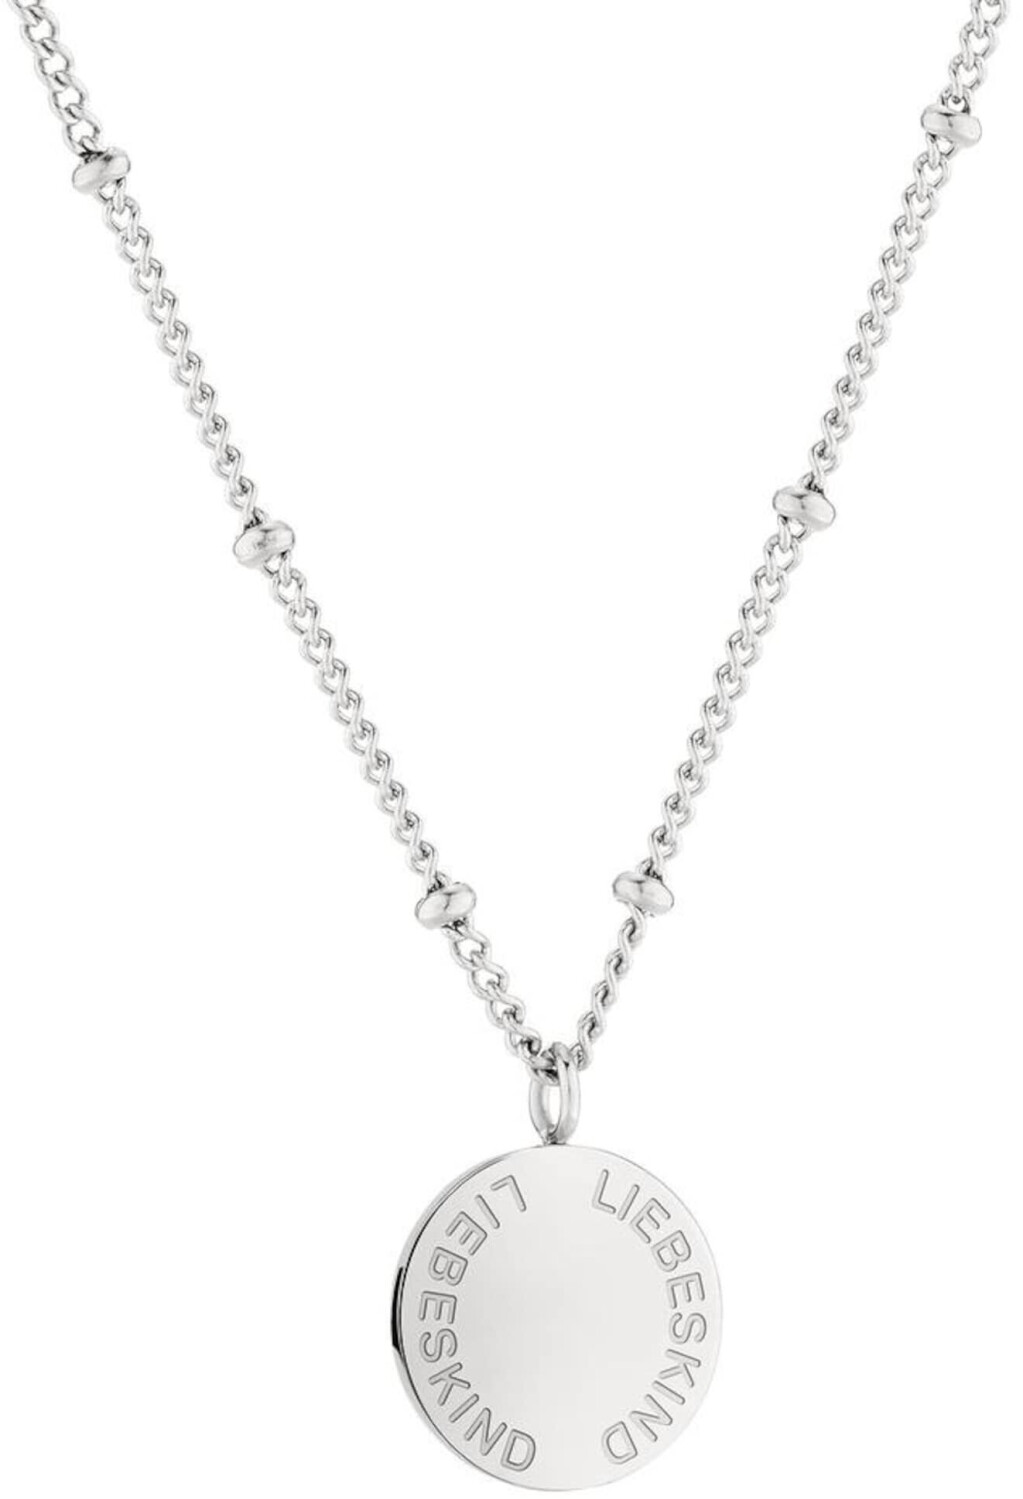 Liebeskind Halskette LJ-058-N-46 silber